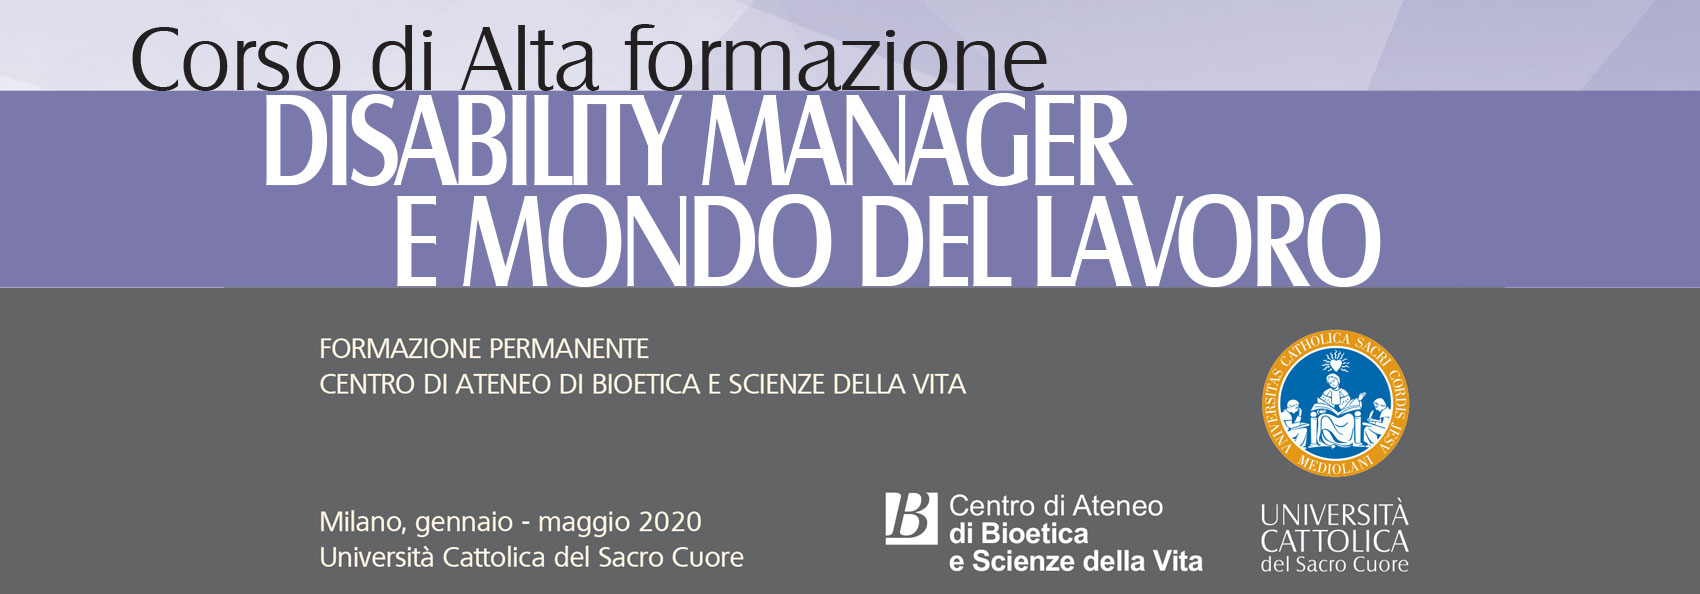 Diability manager Uni Cattolica